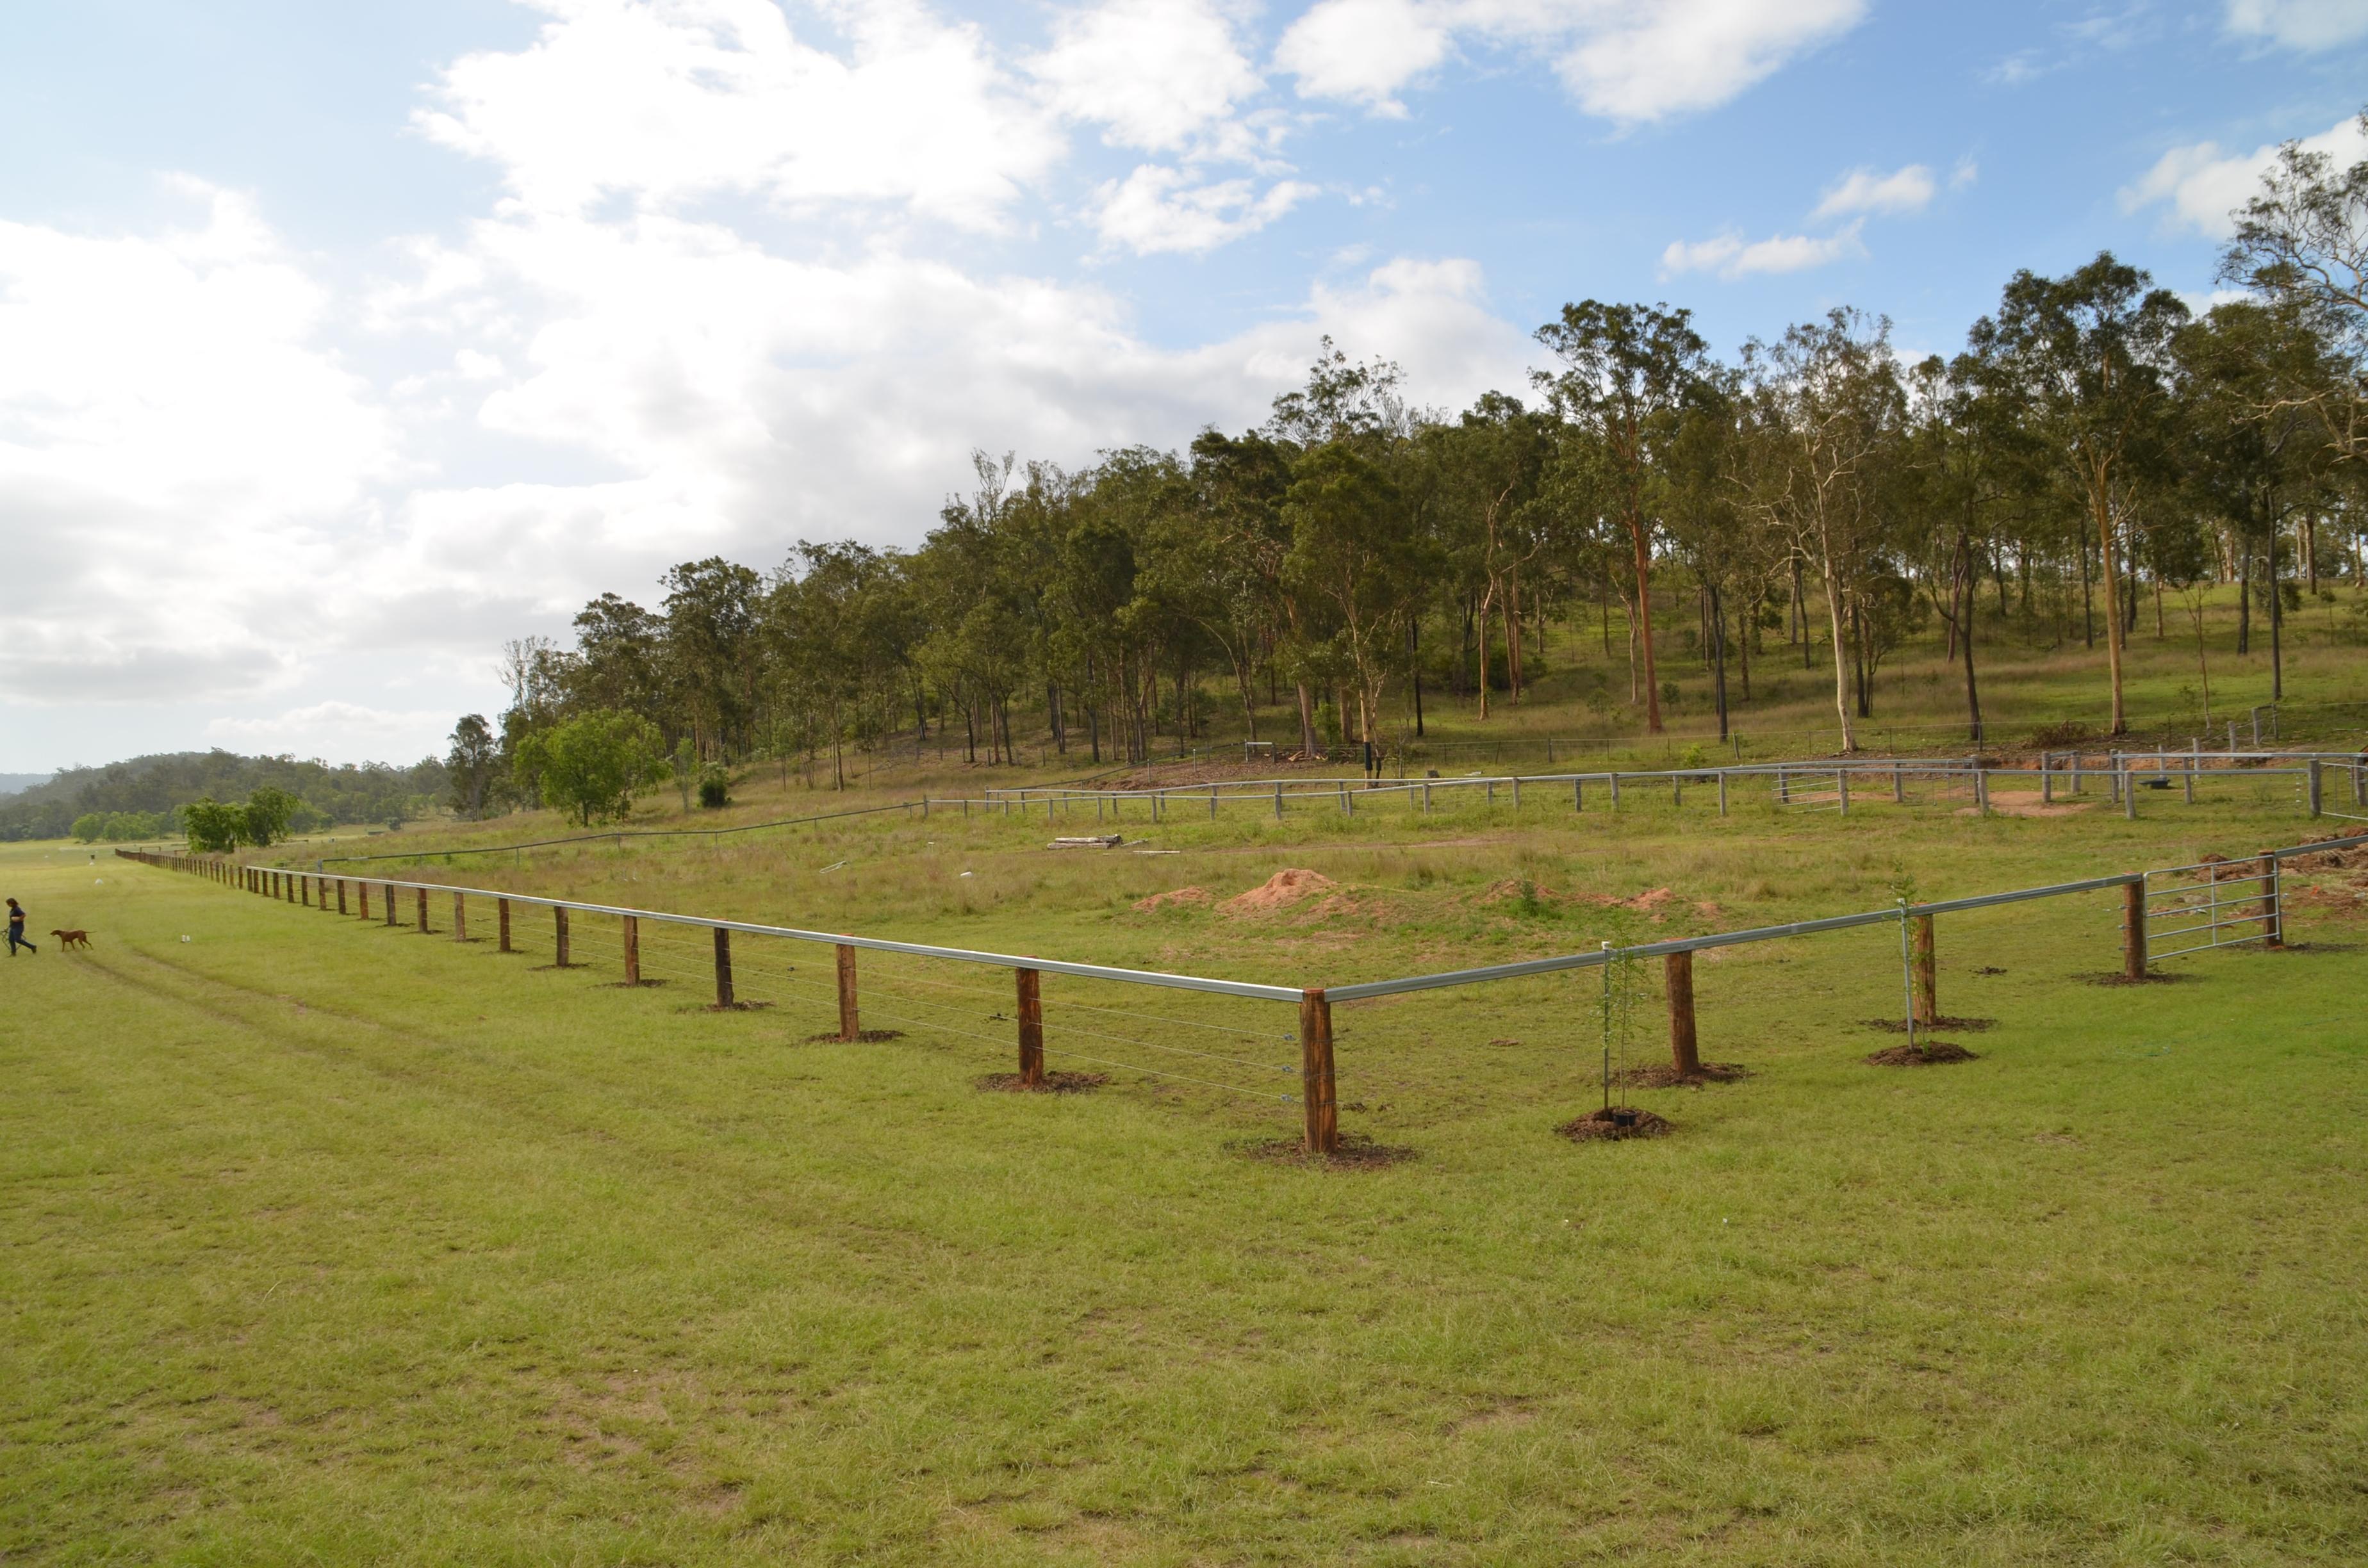 Stallion fence